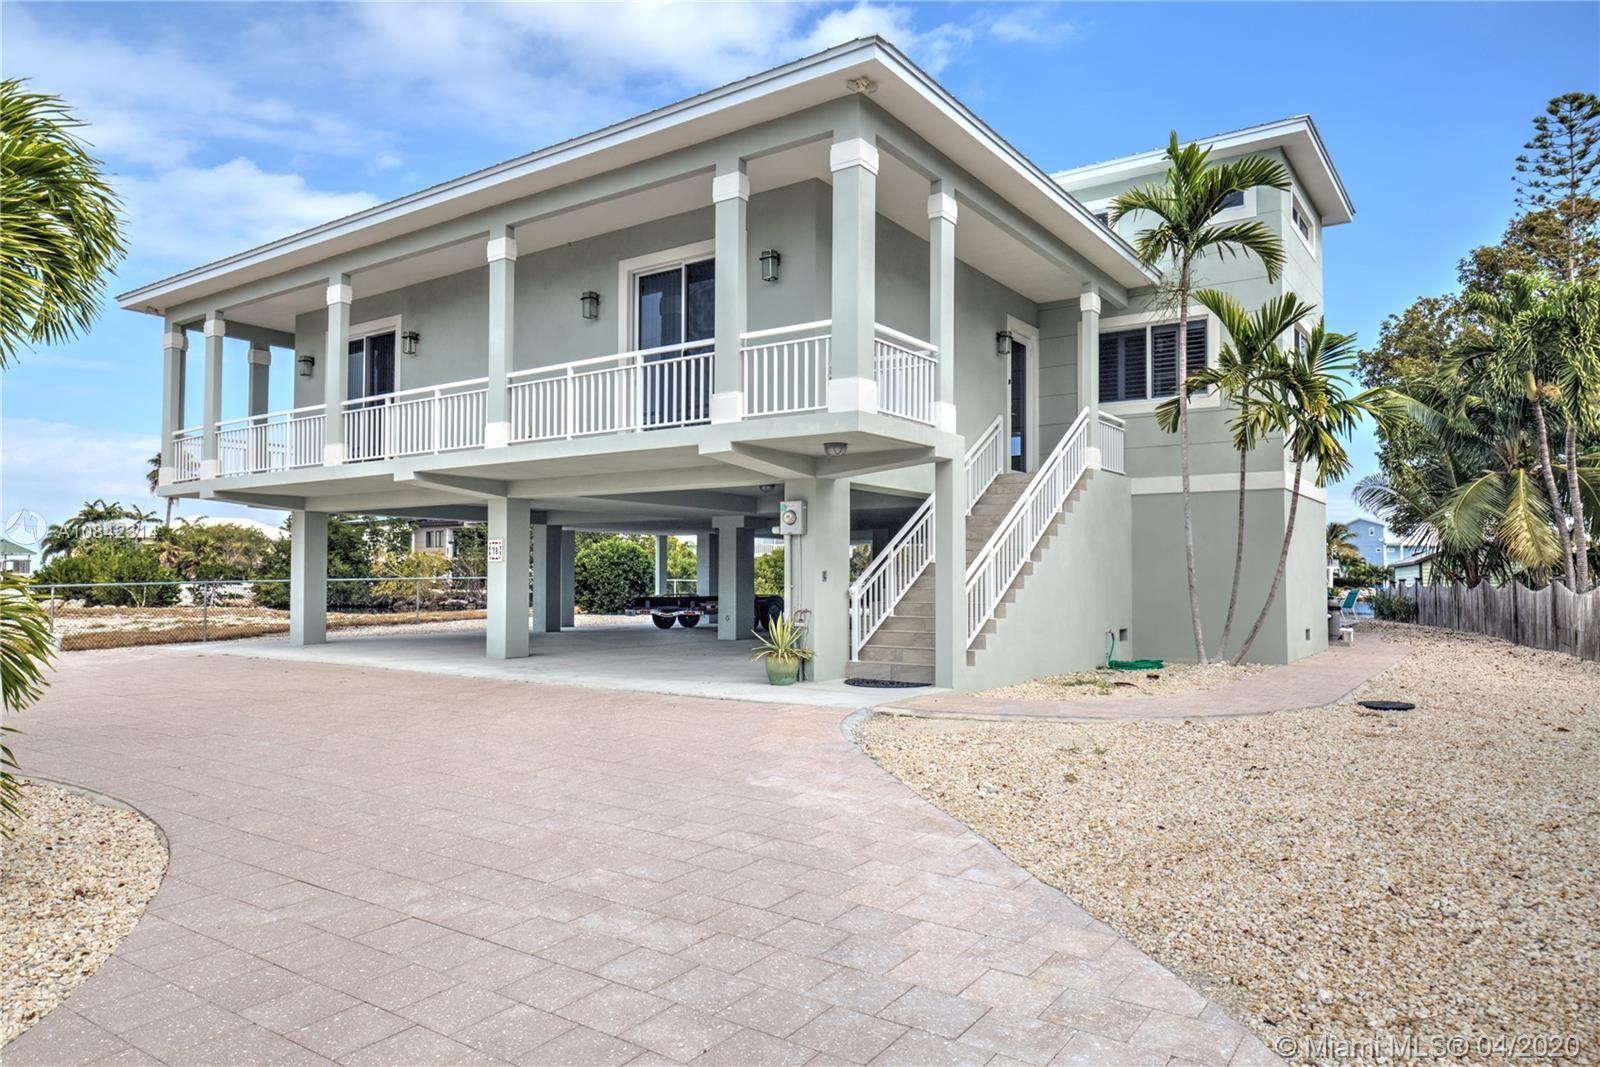 78 N Bounty Lane, Key Largo, FL 33037 - #: A10842314